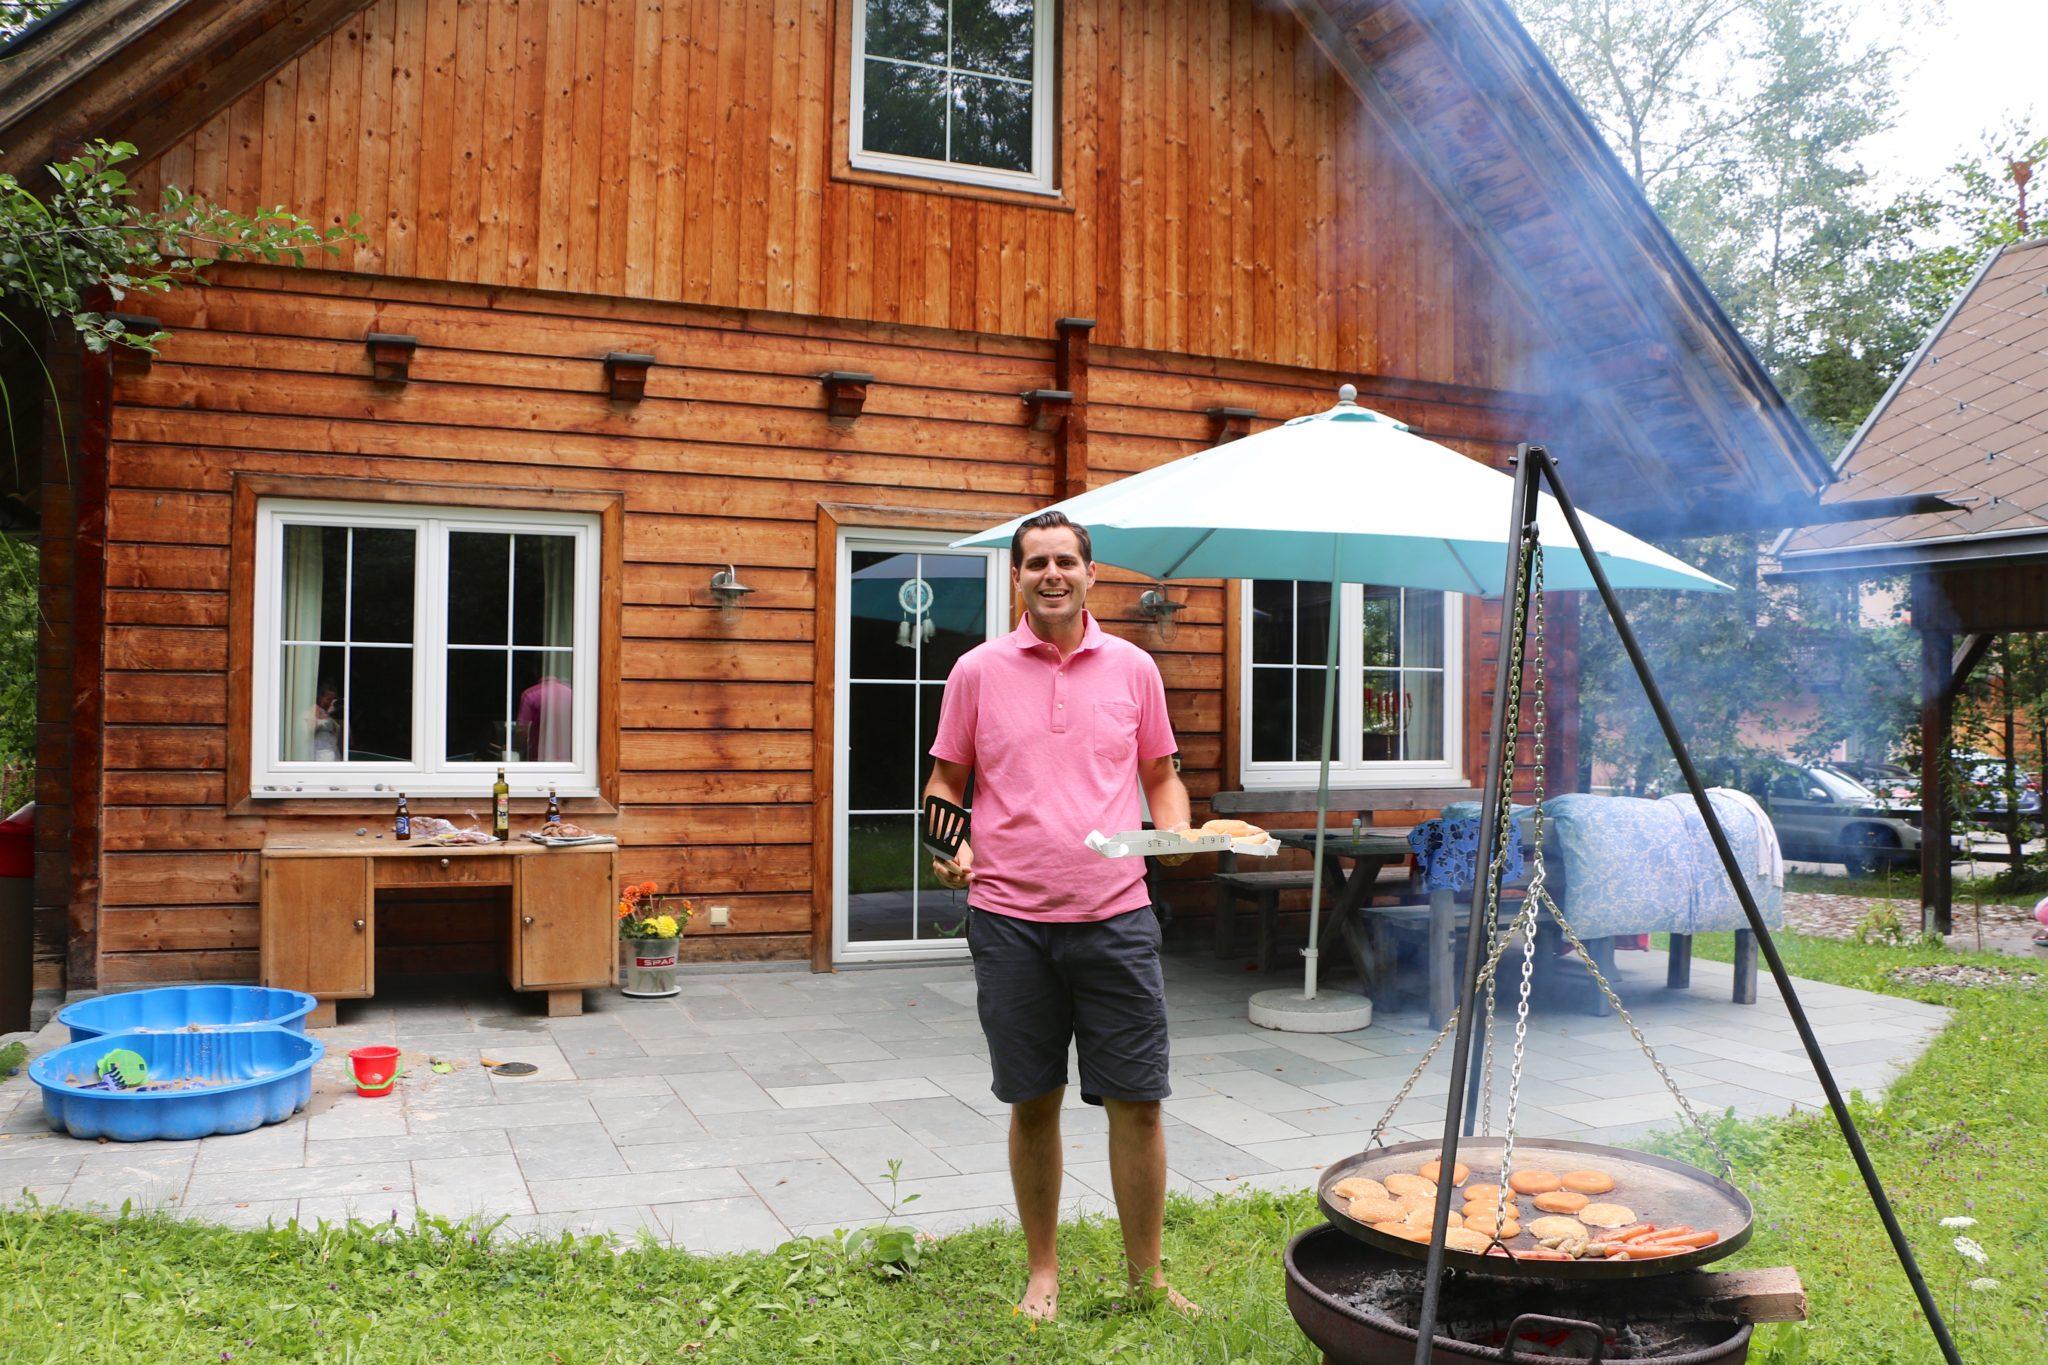 Grilling Fir Pit Austria